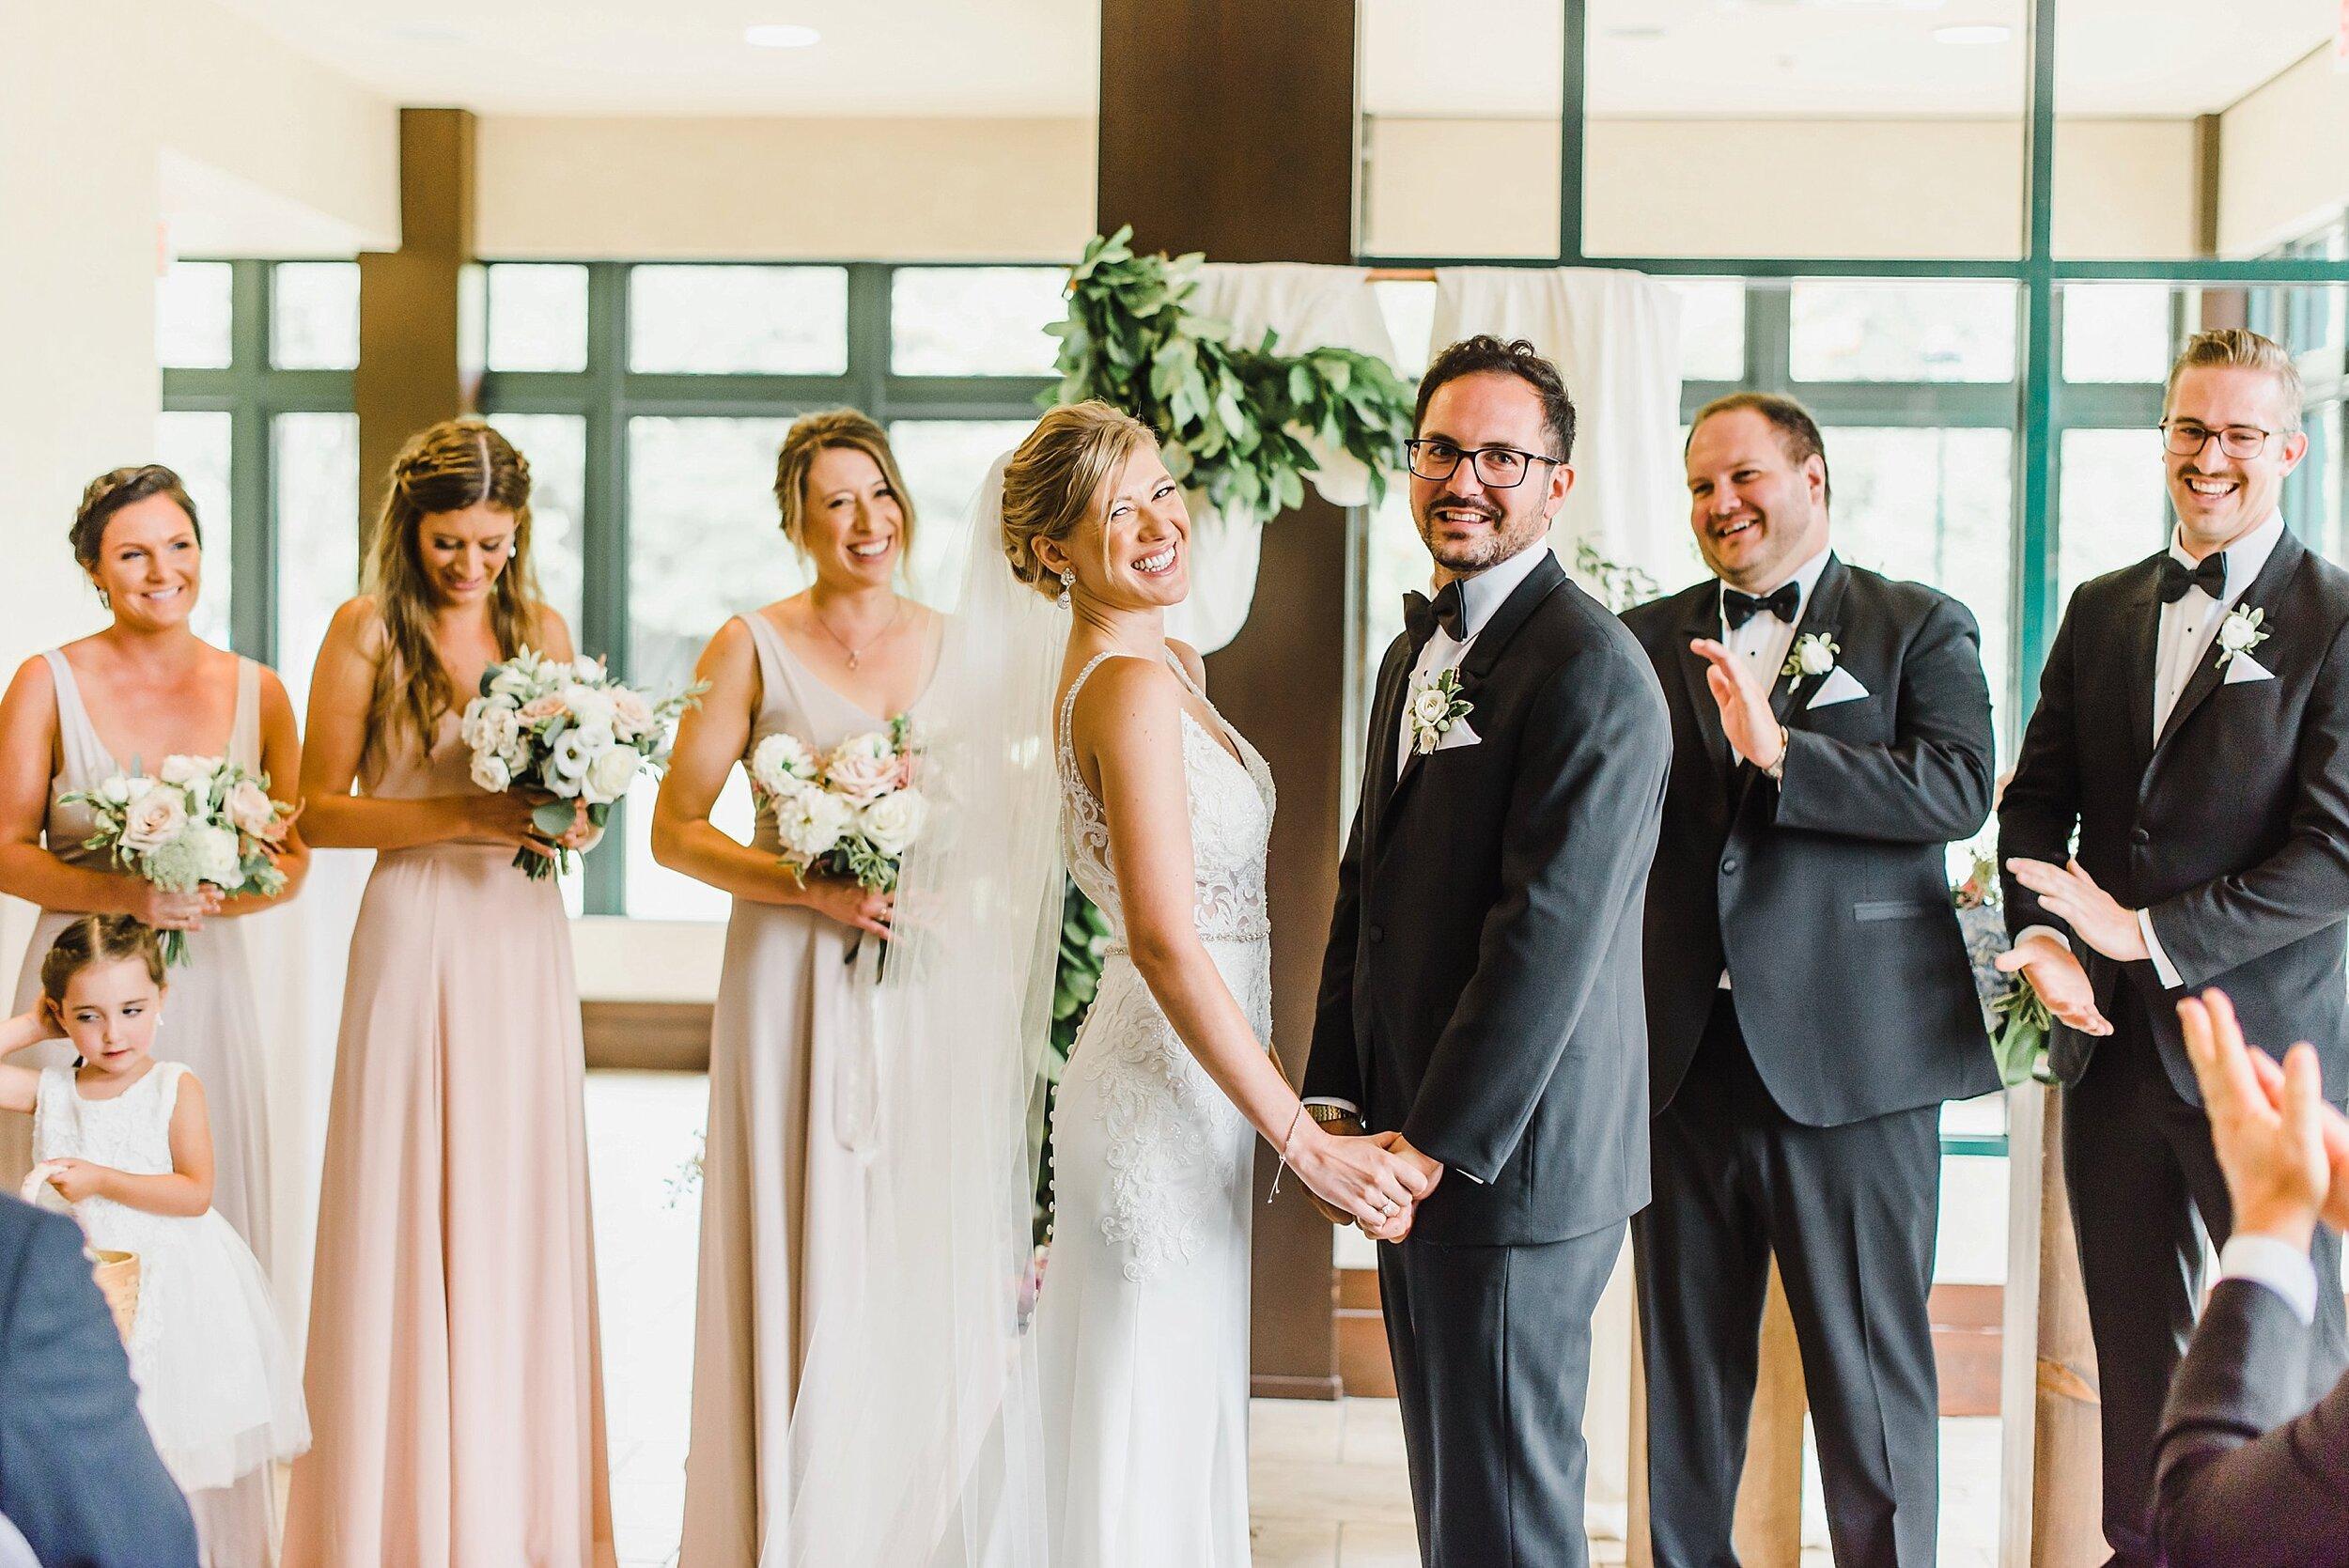 light airy fine art ottawa wedding photographer | Ali and Batoul Photography | Fairmont Le Chateau Montebello38.jpg